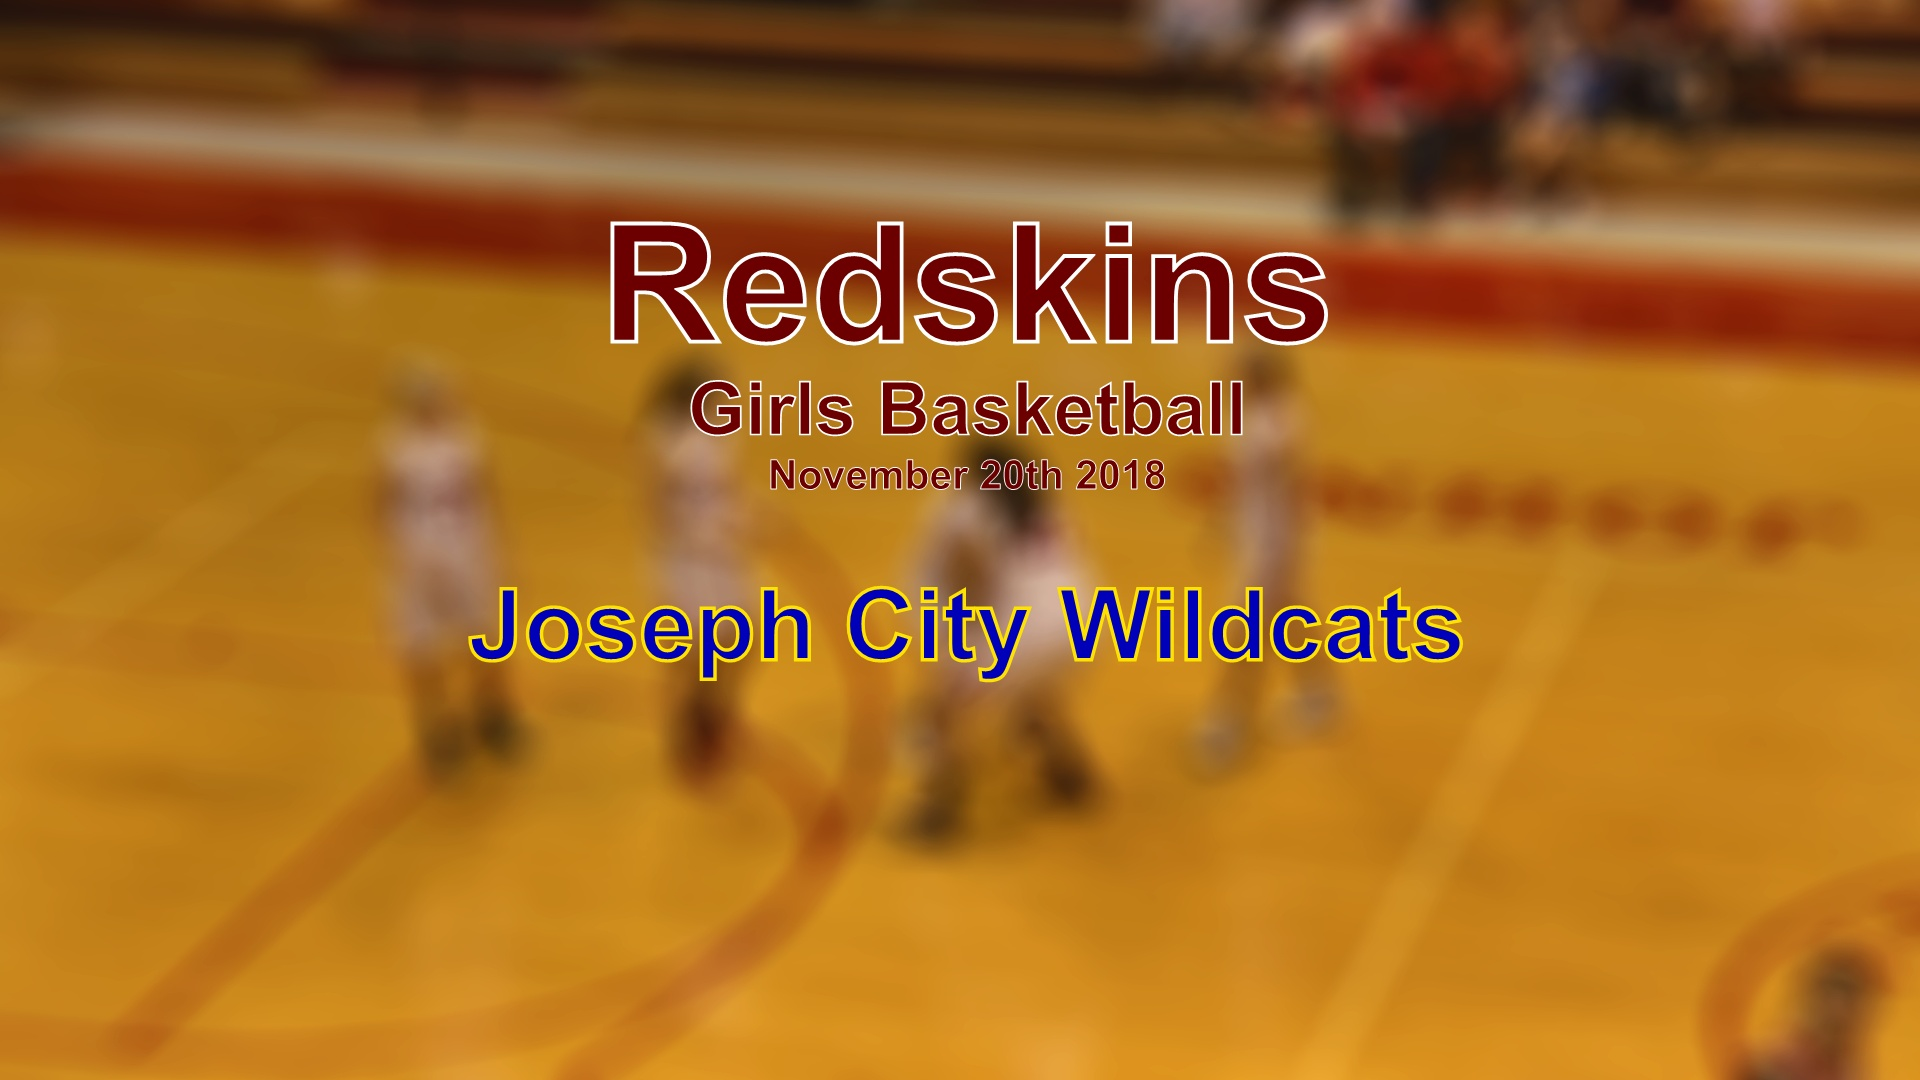 2018 Girls Basketball - Joseph City